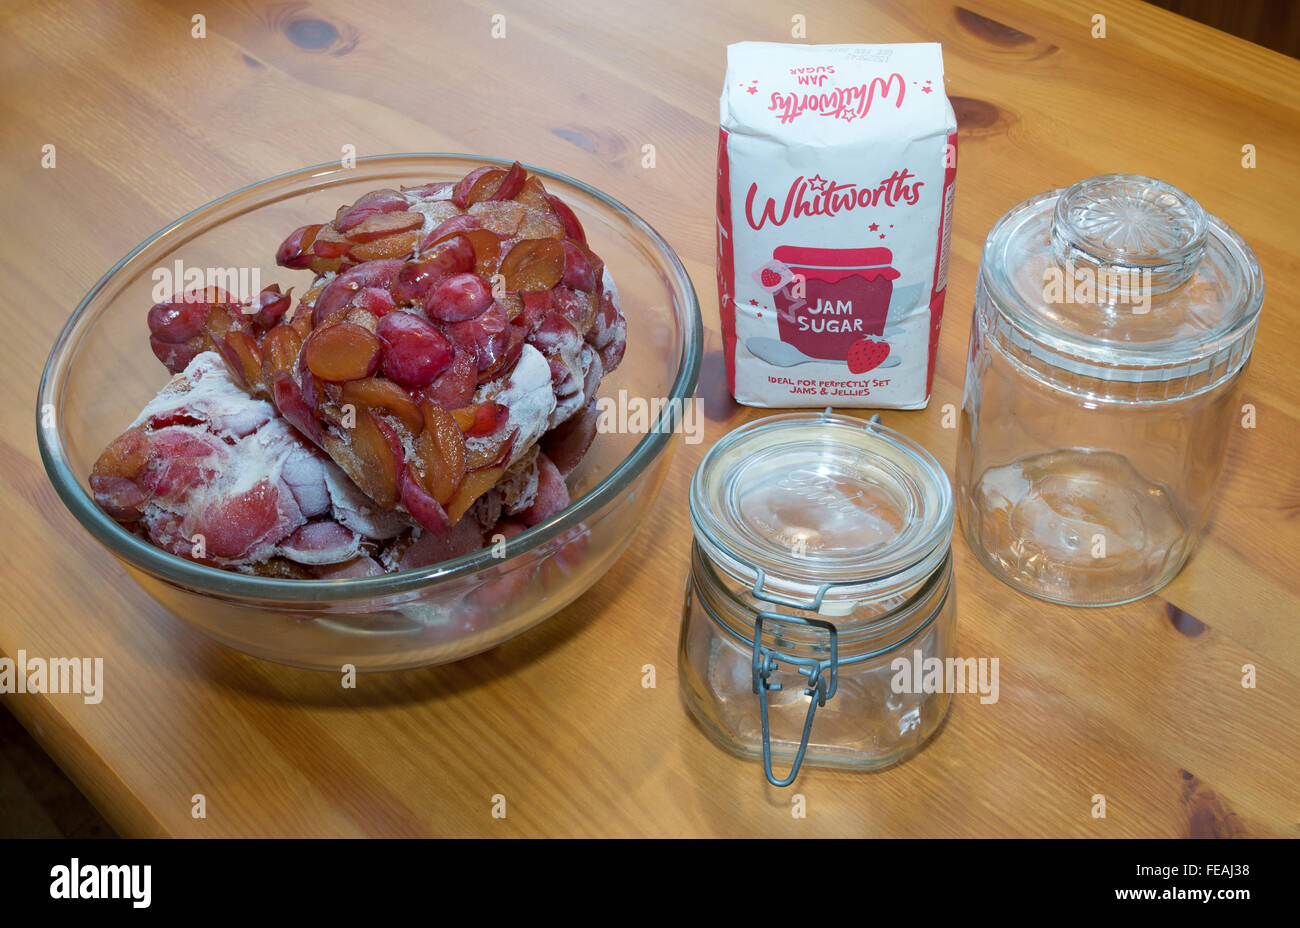 Plum jam making ingredients, defrosting plums, Whitworths jam sugar and preserving jars. - Stock Image